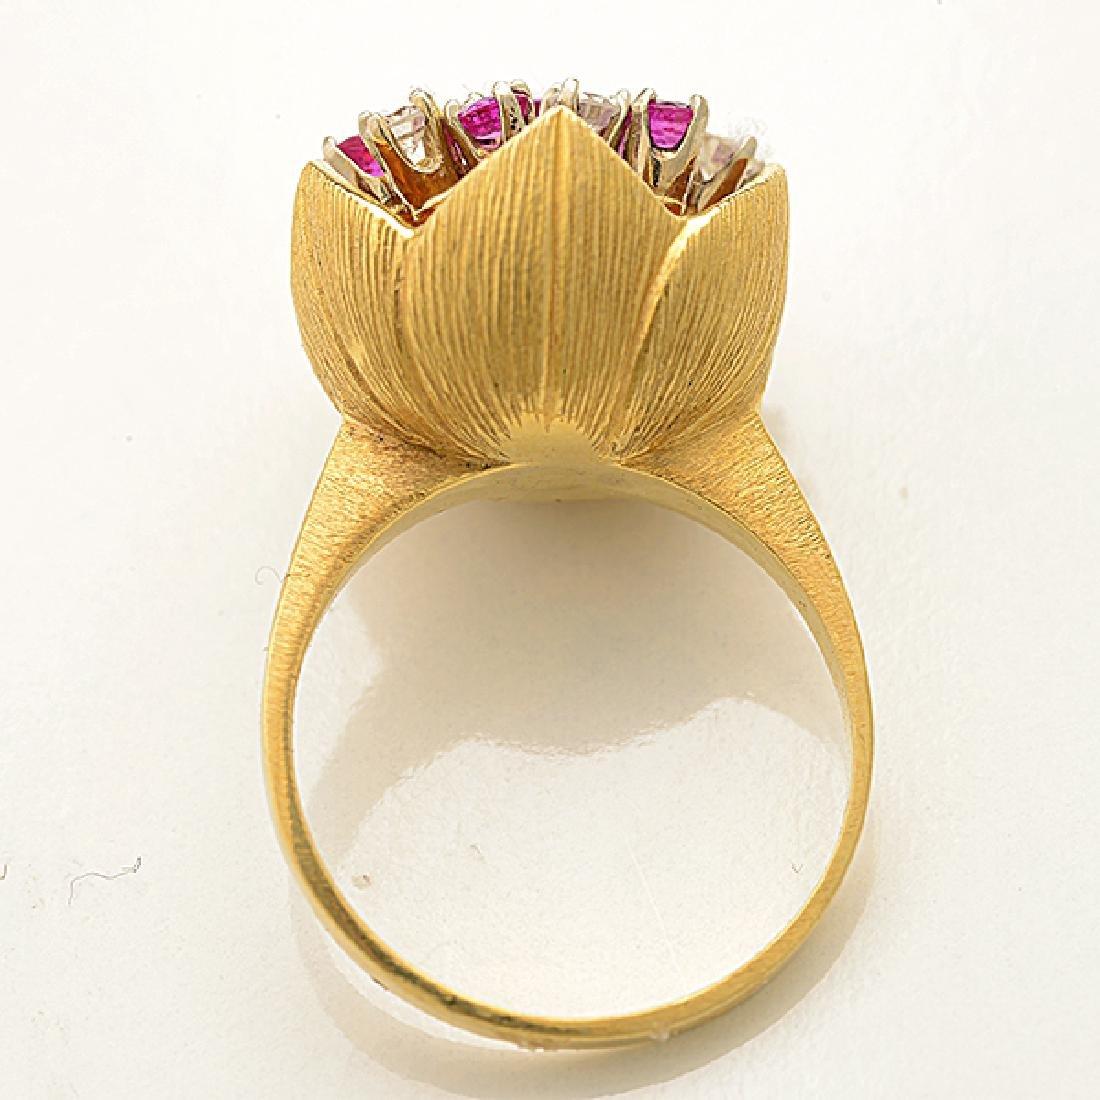 Diamond, Pink Sapphire, 18k Yellow Gold Ring. - 3